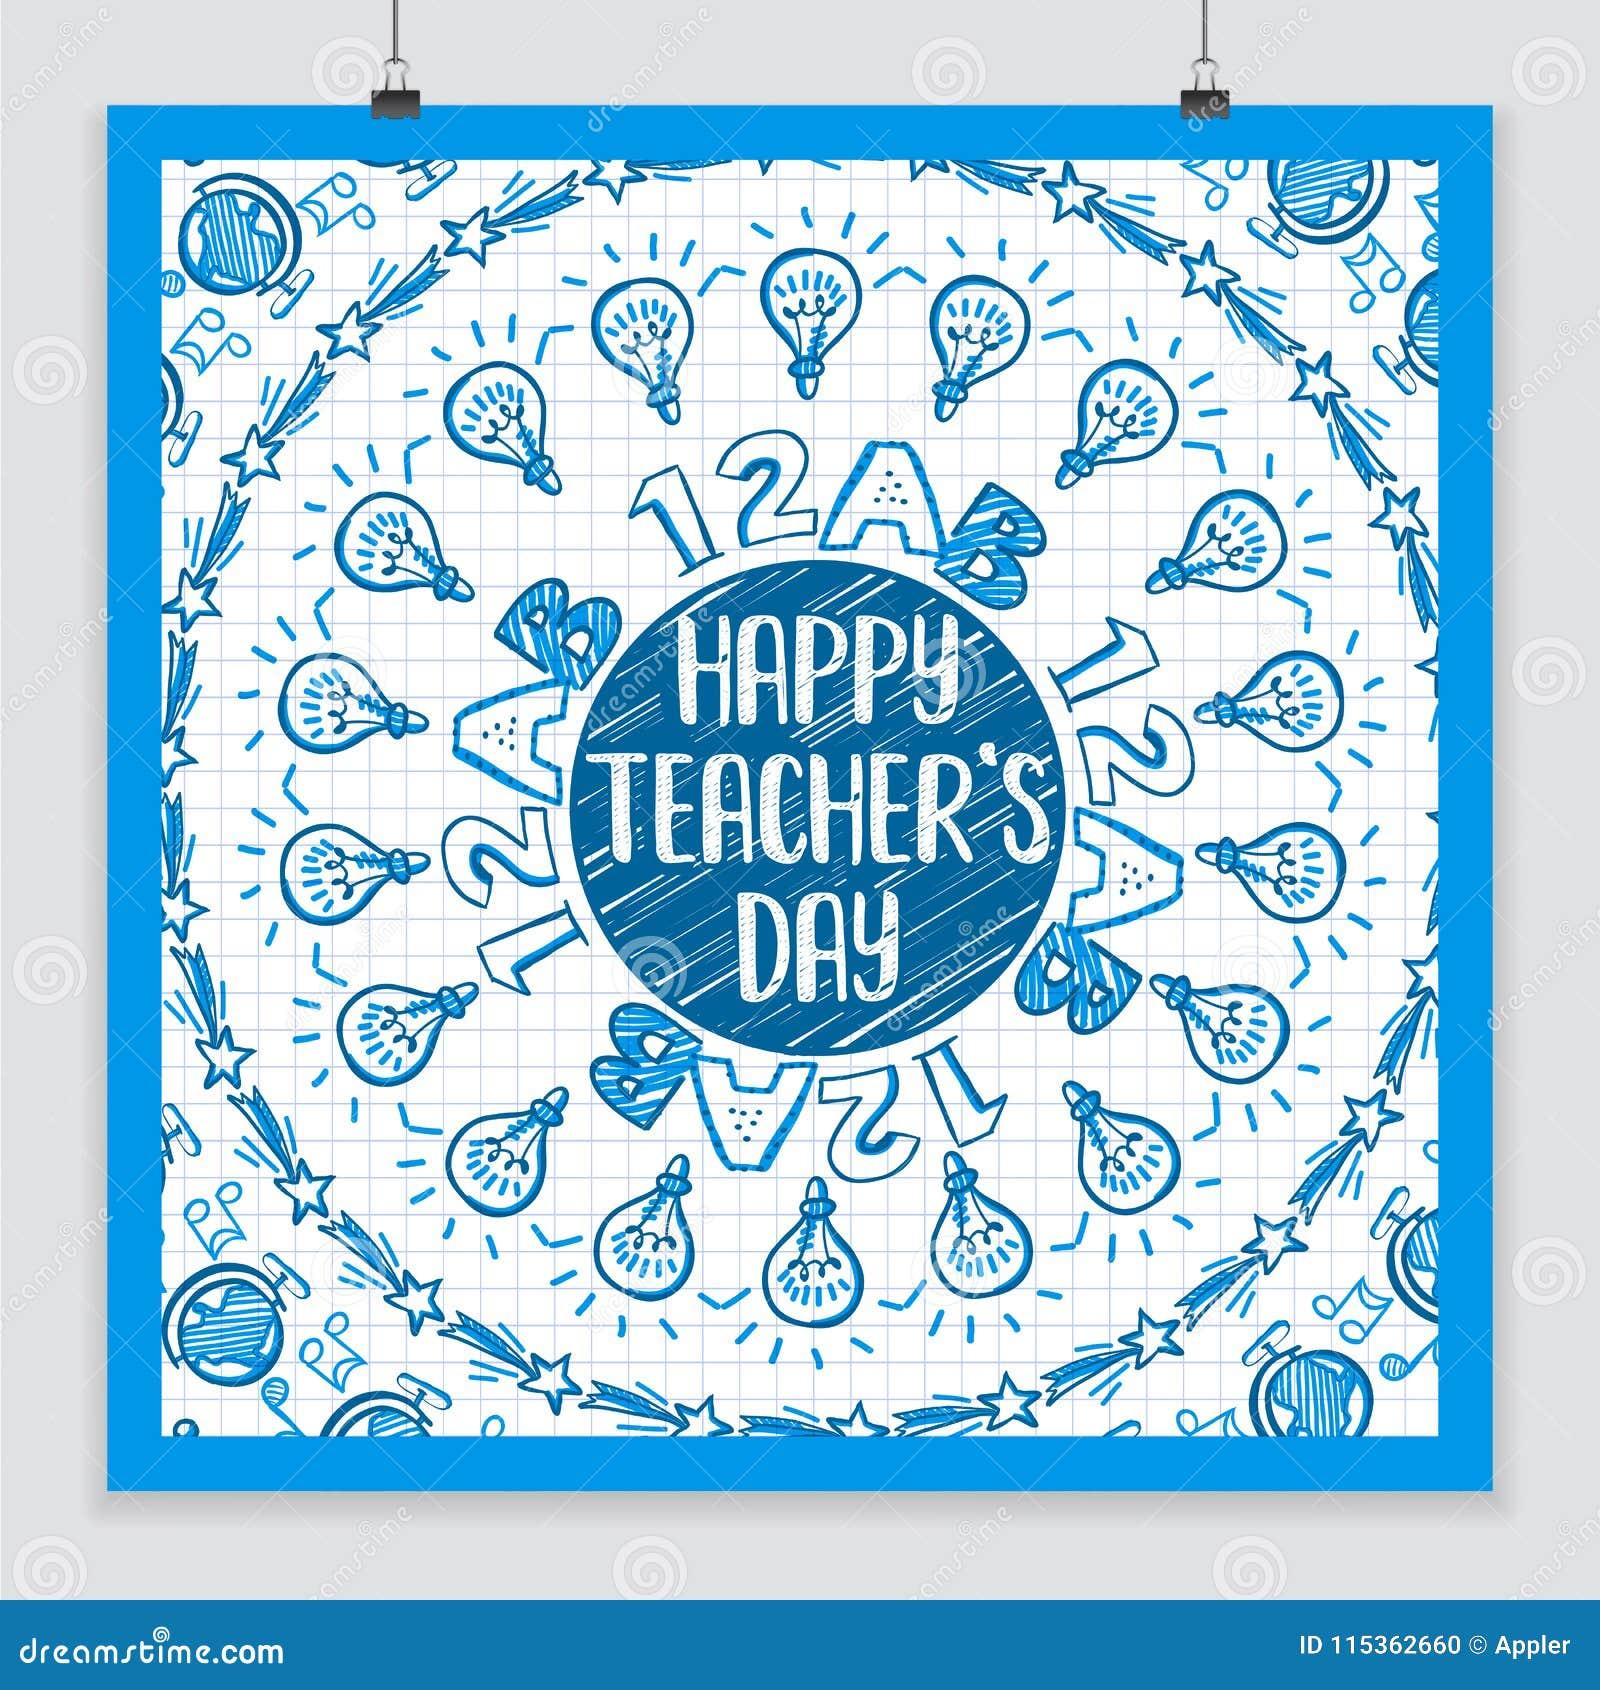 Happy Teachers Holiday Poster Stock Vector Illustration Of Brain